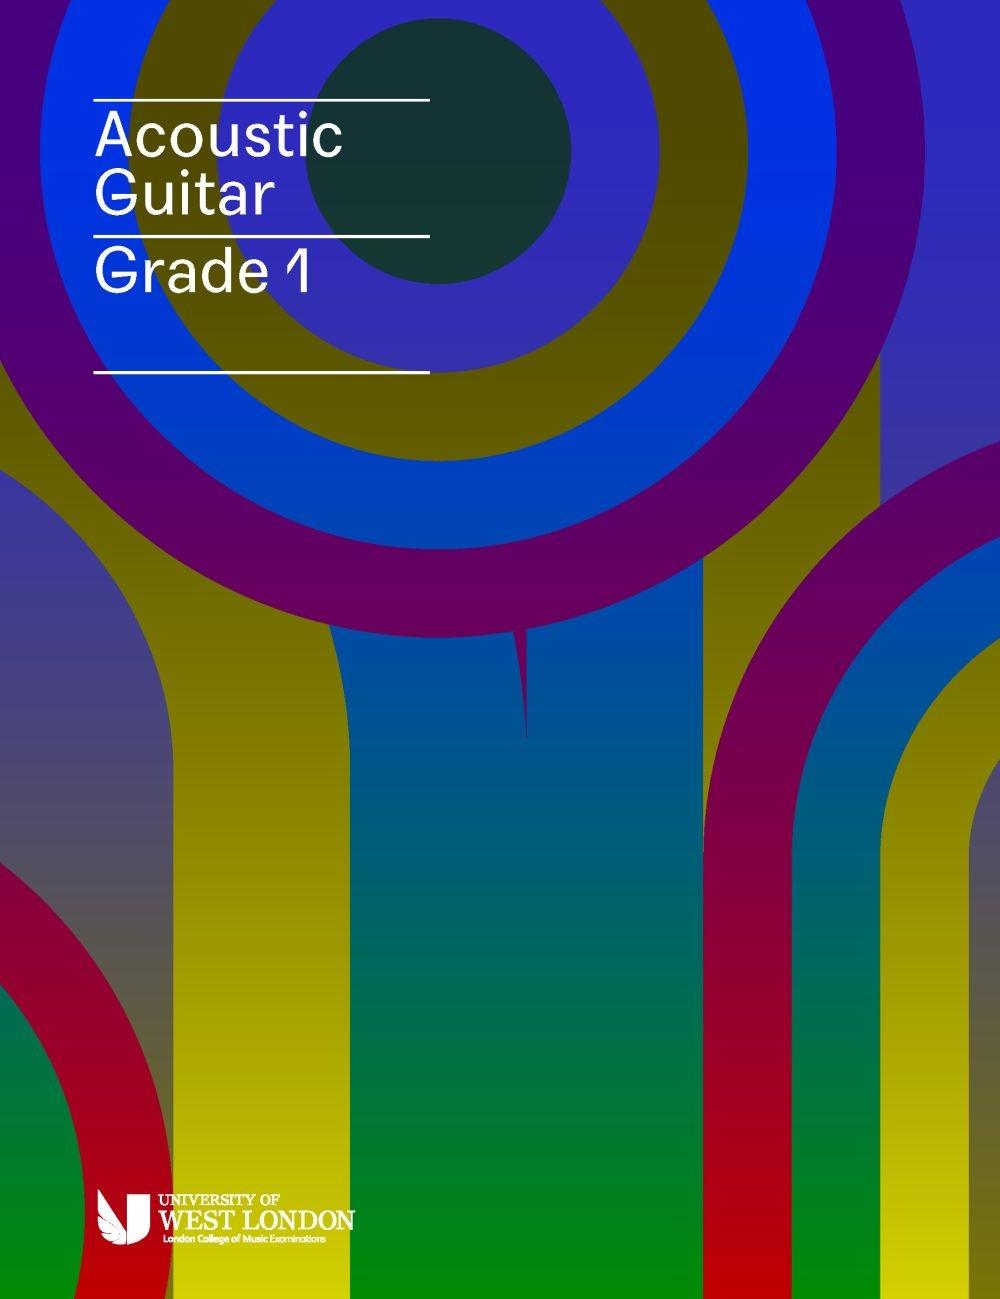 LCM Acoustic Guitar Handbook Grade 1 2020: Acoustic Guitar: Instrumental Tutor